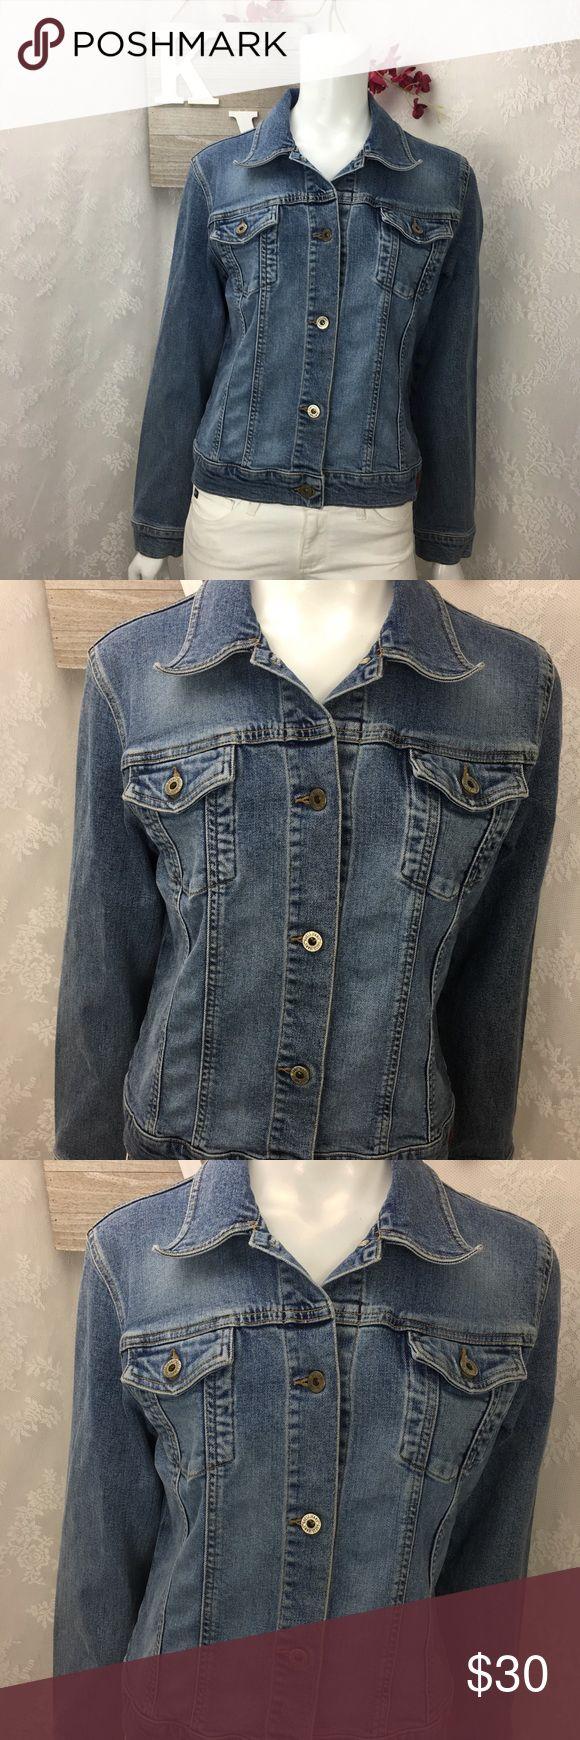 Guess Jean Denim jacket Size Large Women's guess denim jacket button down front pockets Bust 18 Length 20 Sleeve 24 Guess Jackets & Coats Jean Jackets